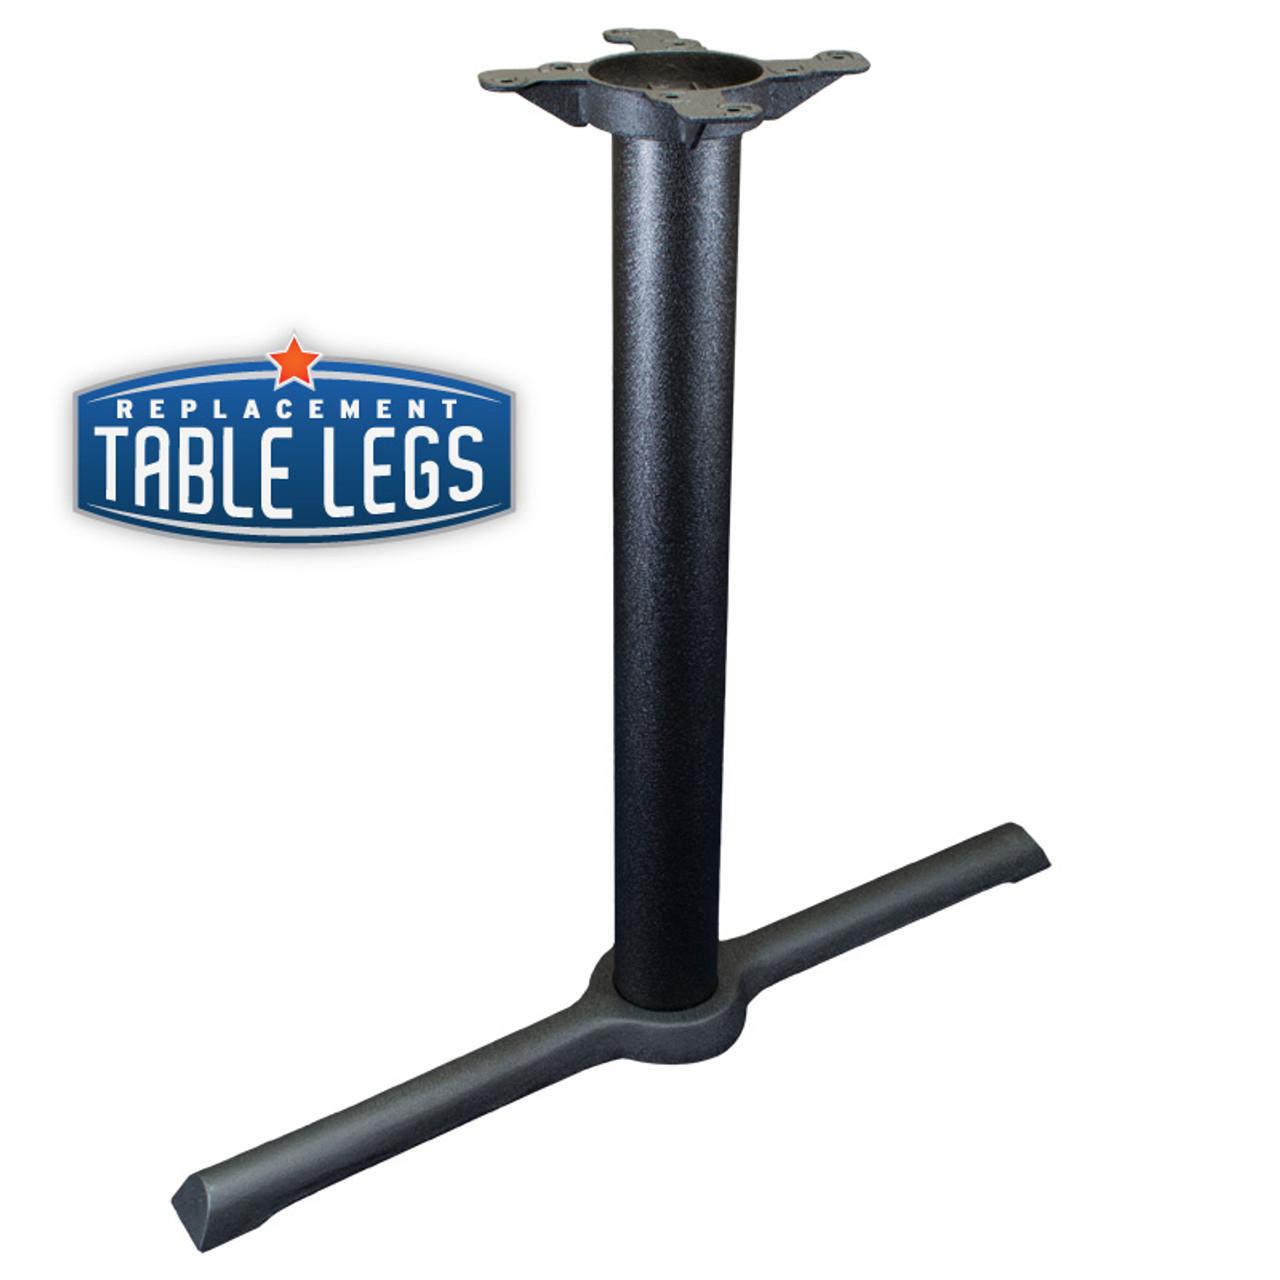 "CAST IRON TABLE BASE, X Style 5""x30"" End, 28"" height, 3"" diameter steel column - replacementtablelegs.com"